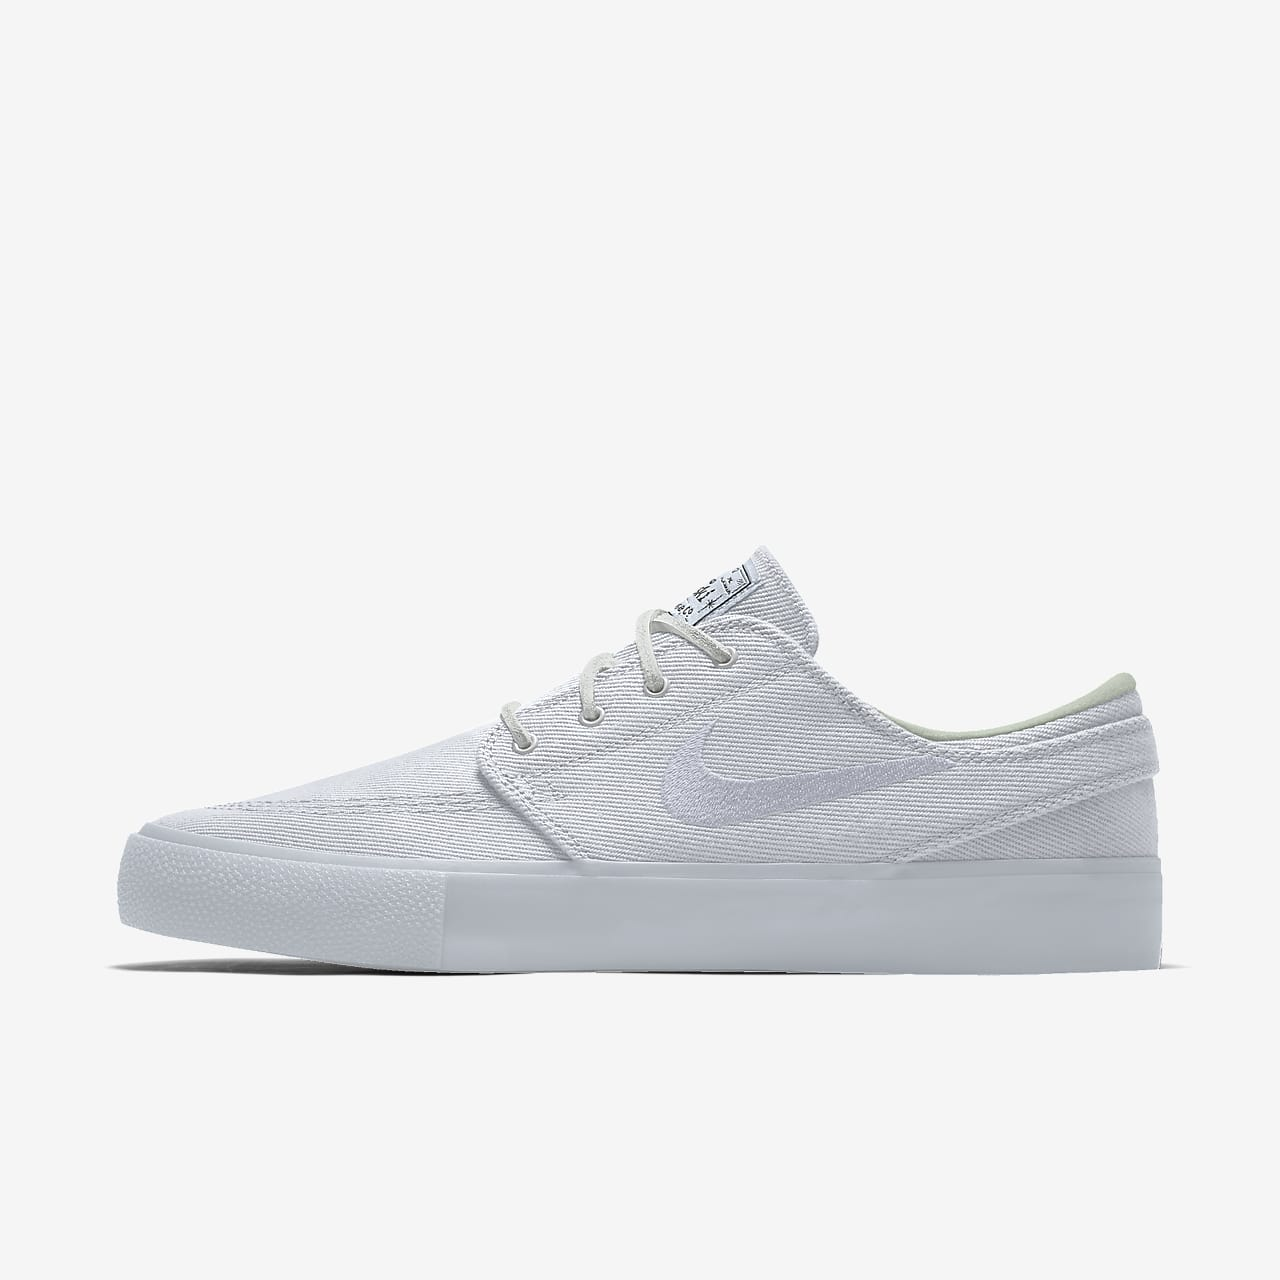 Мужские кроссовки для скейтбординга Nike SB Air Zoom Janoski RM By You